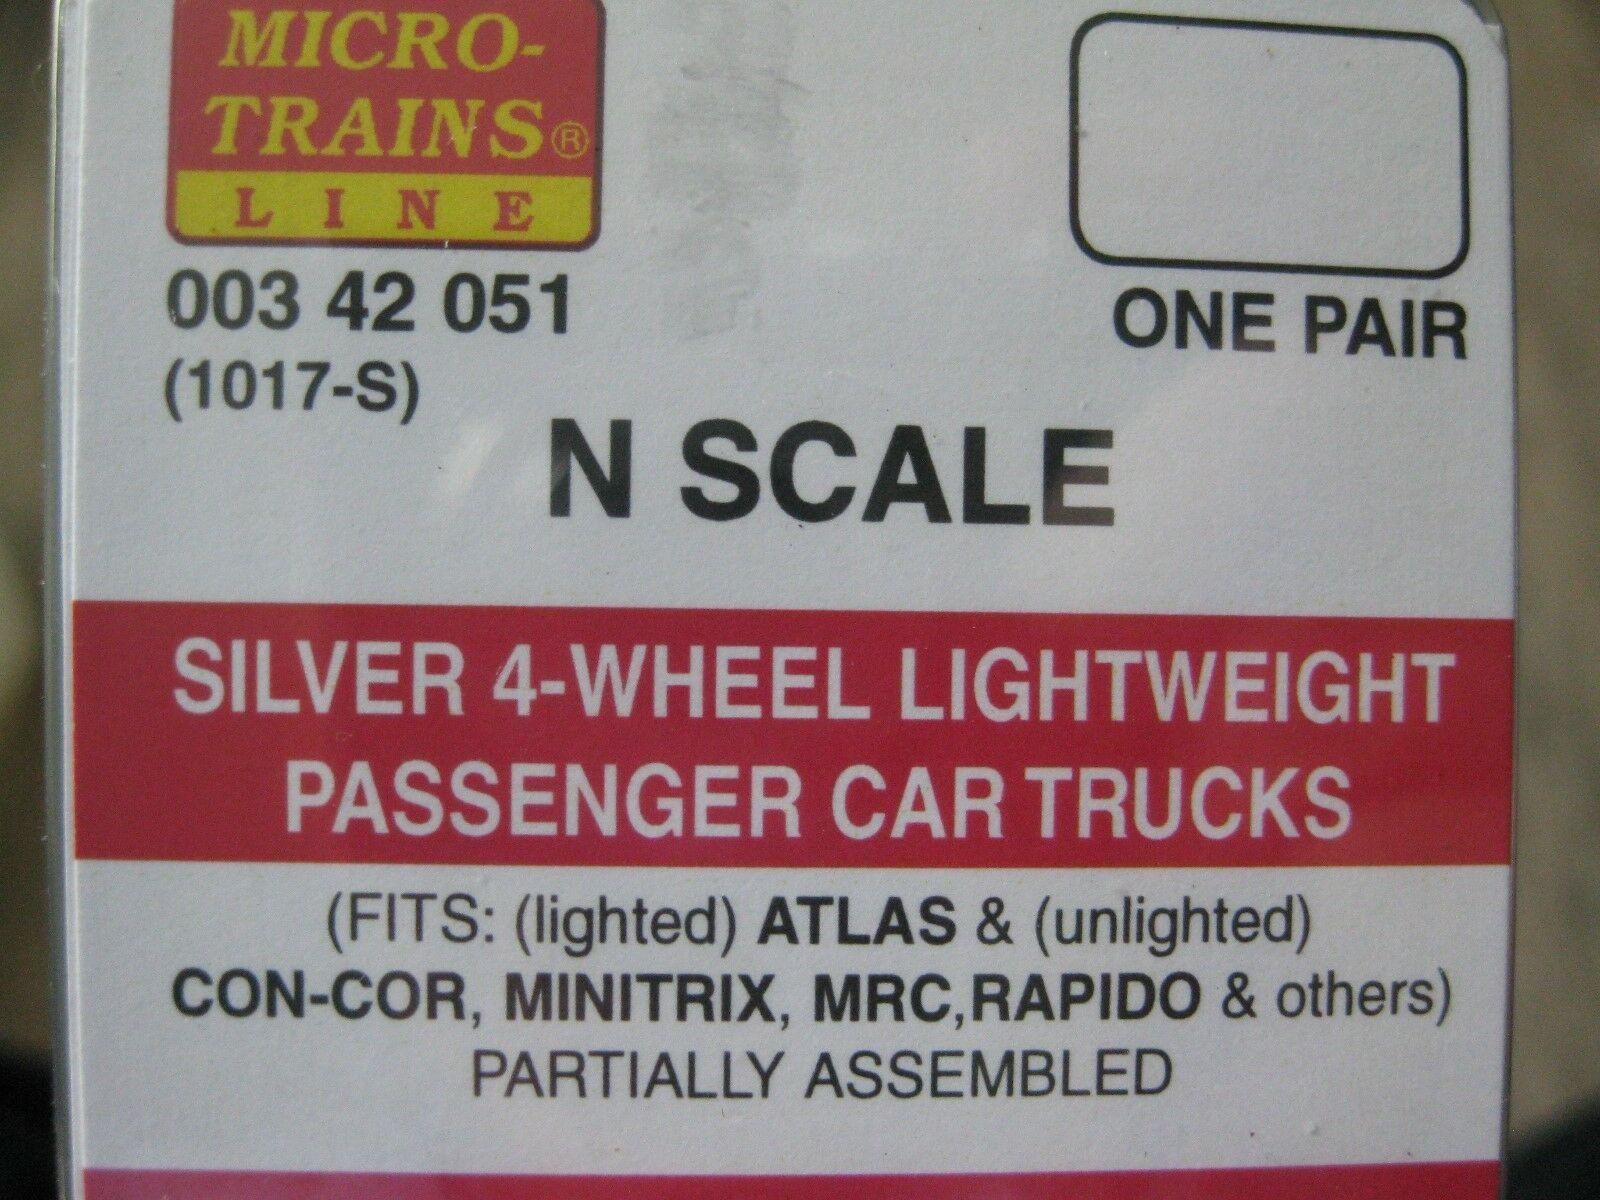 Micro-Trains Stock #00342051 Silver 4-Wheel Lightweight Passenger Car Trucks (N)